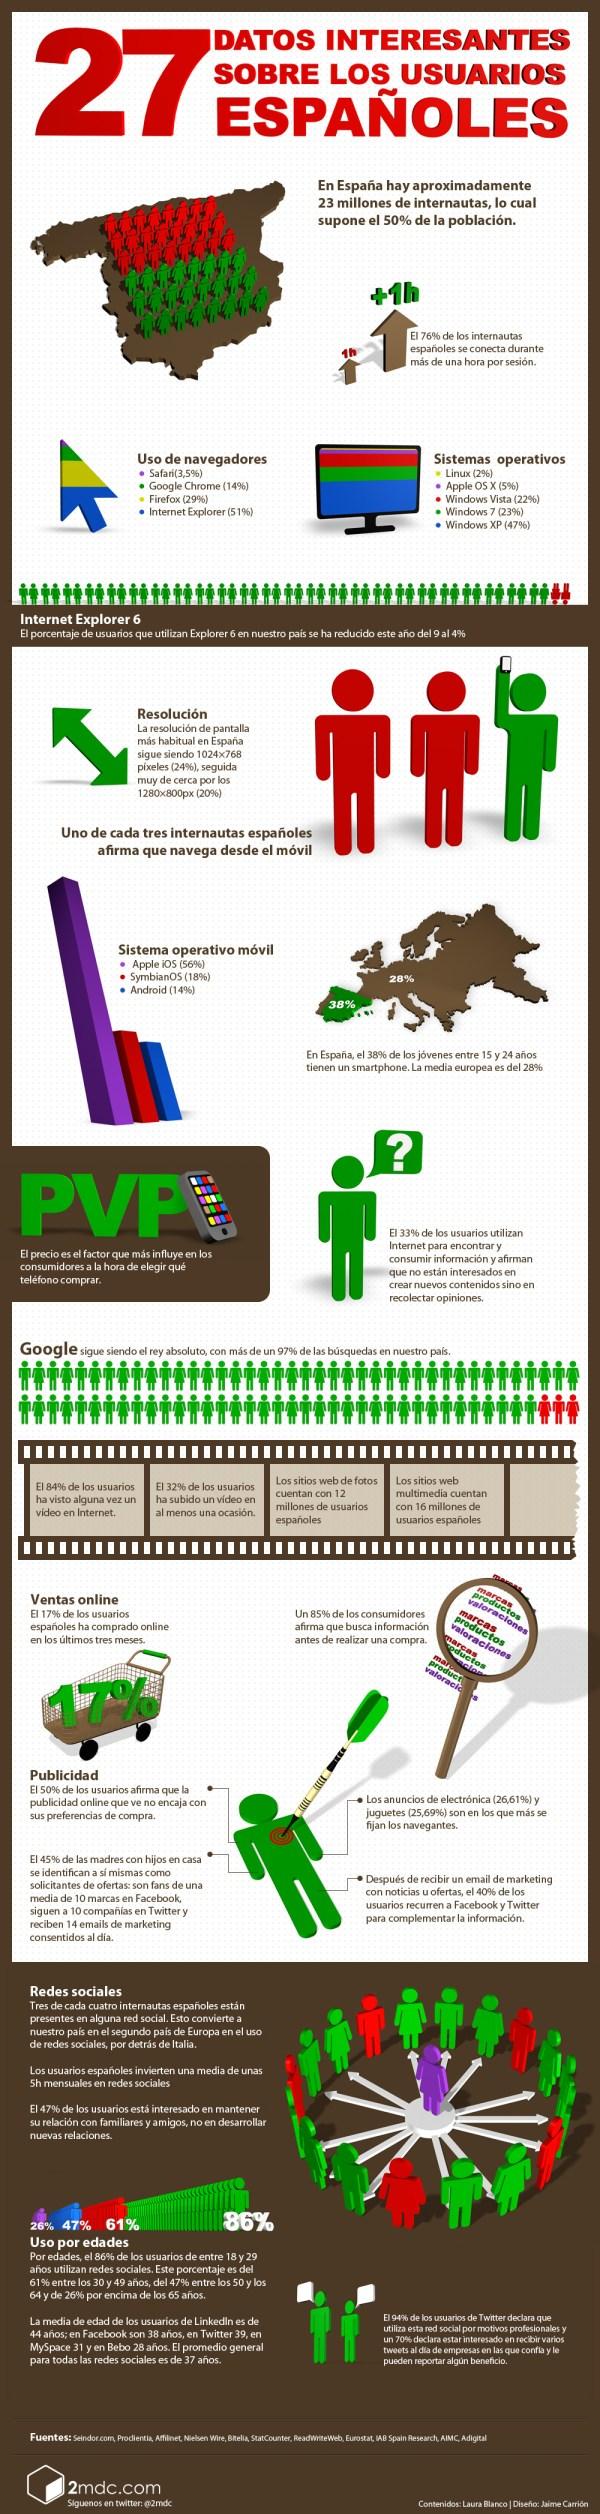 infografia 27 datos usuarios españoles